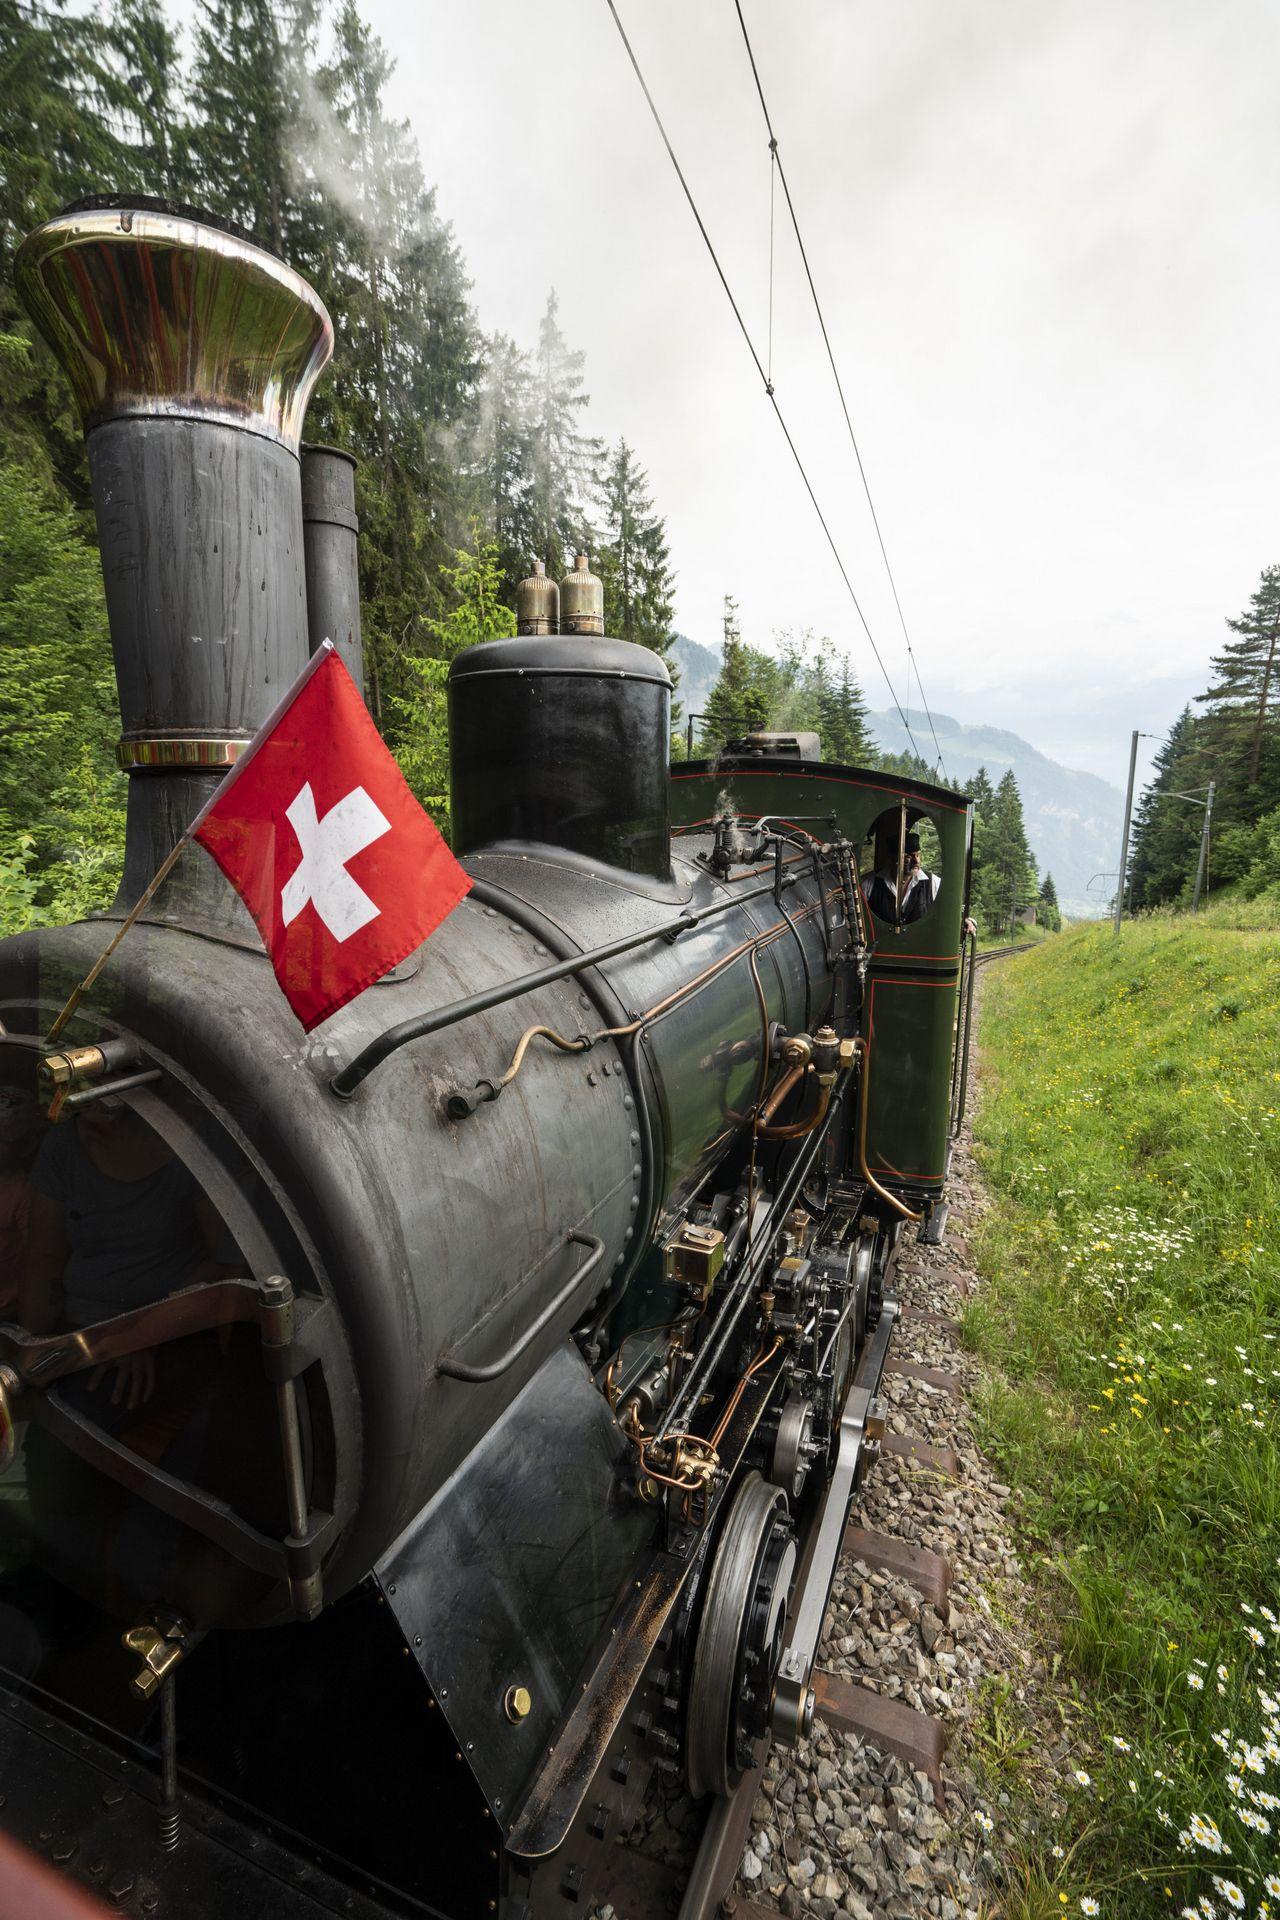 Nostalgic steam train ride